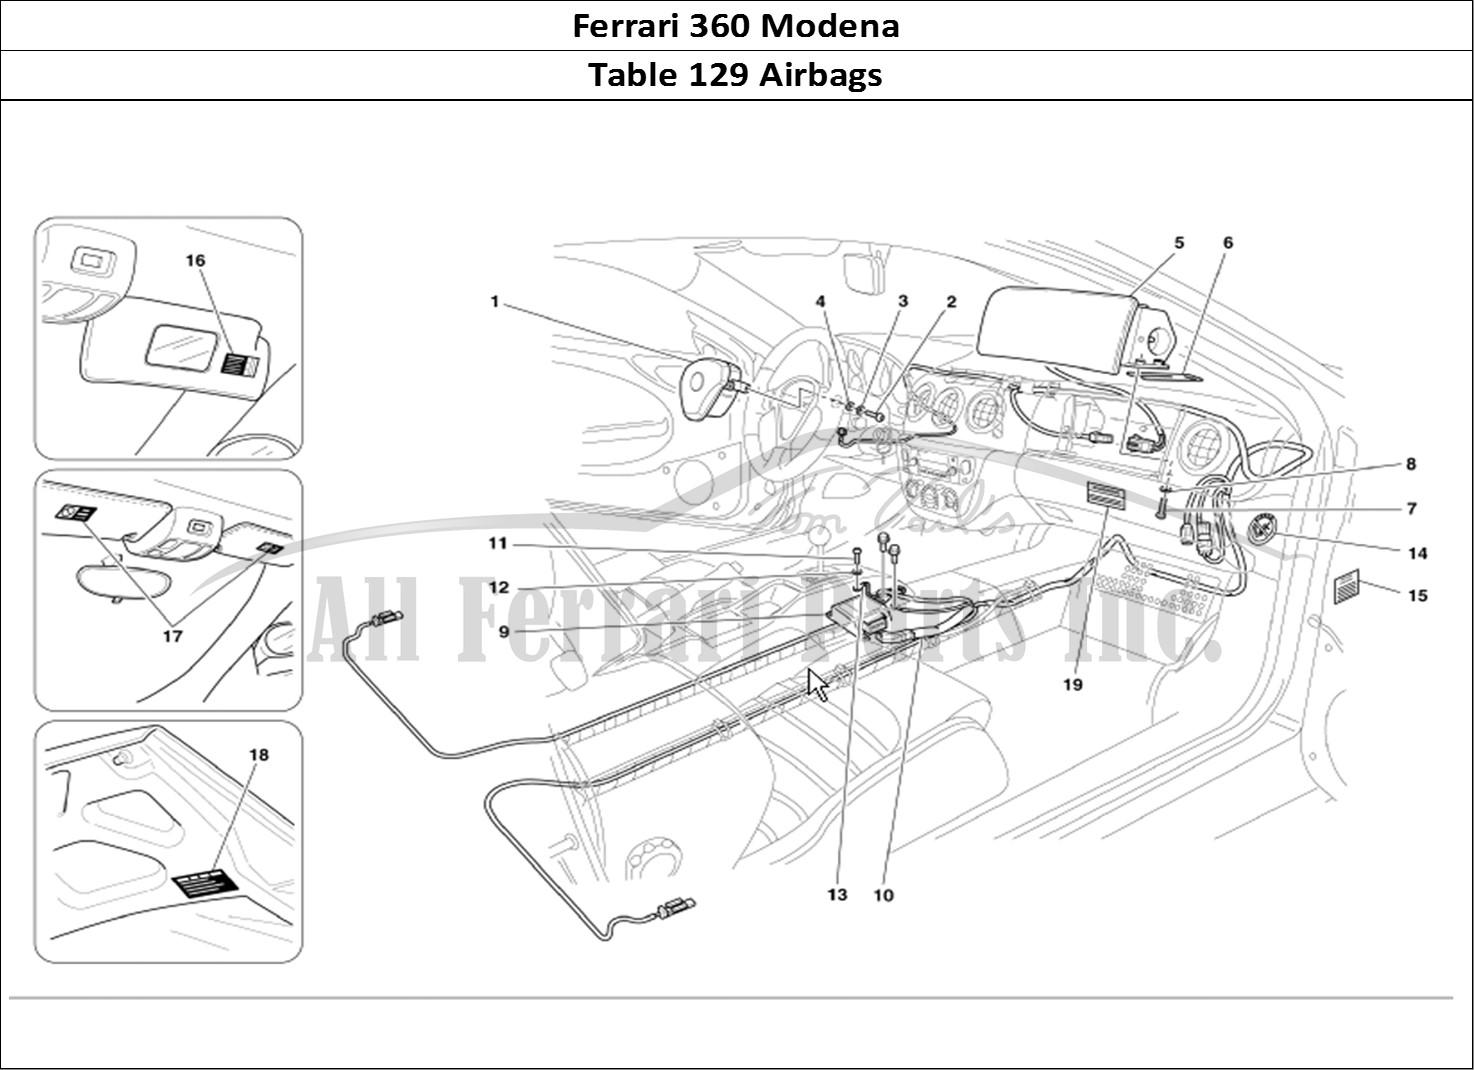 Buy original Ferrari 360 Modena 129 Airbags Ferrari parts